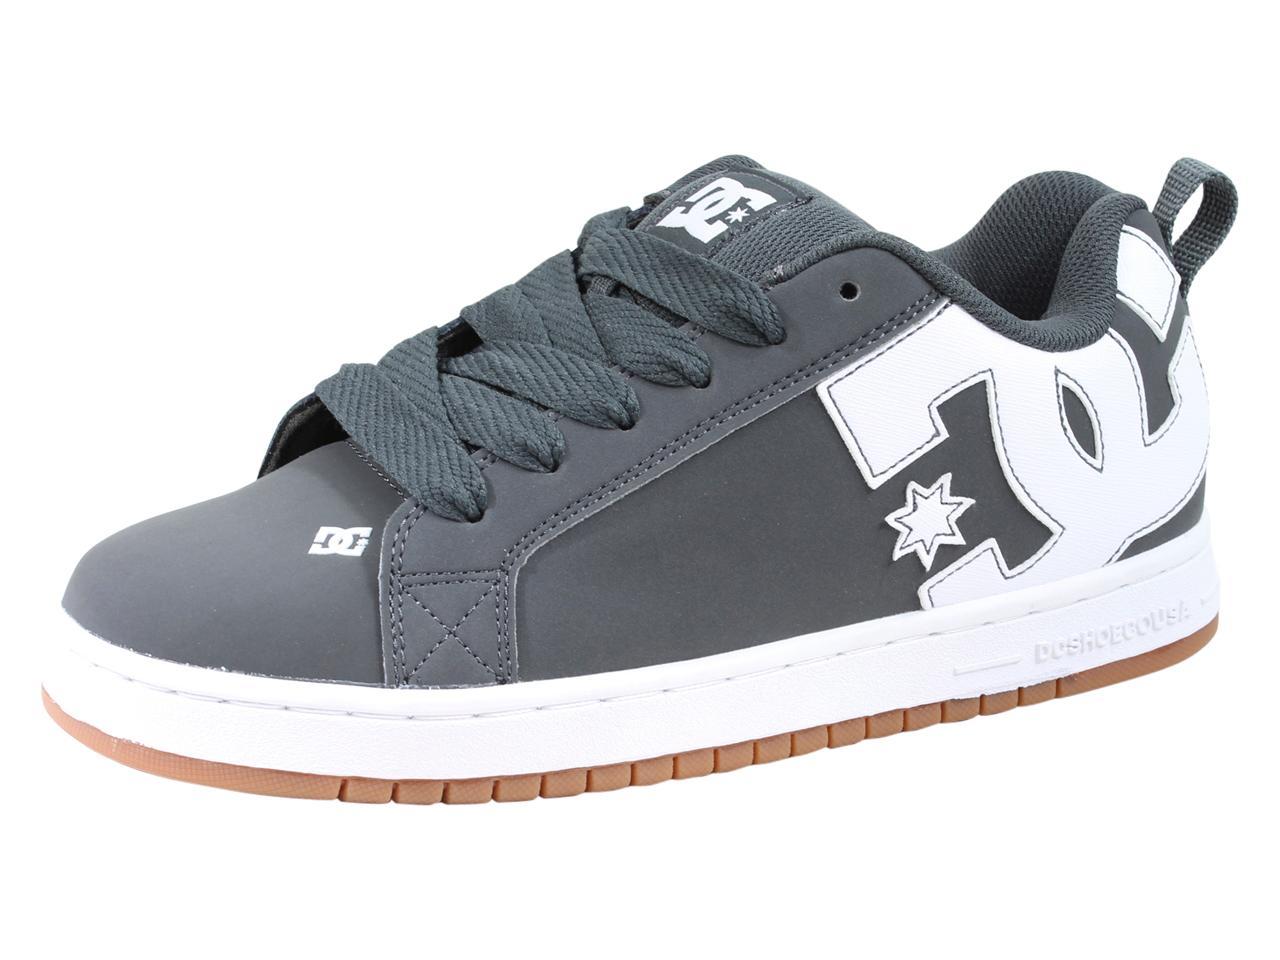 Image of DC Men's Court Graffik Skateboarding Sneakers Shoes - Grey - 9 D(M) US